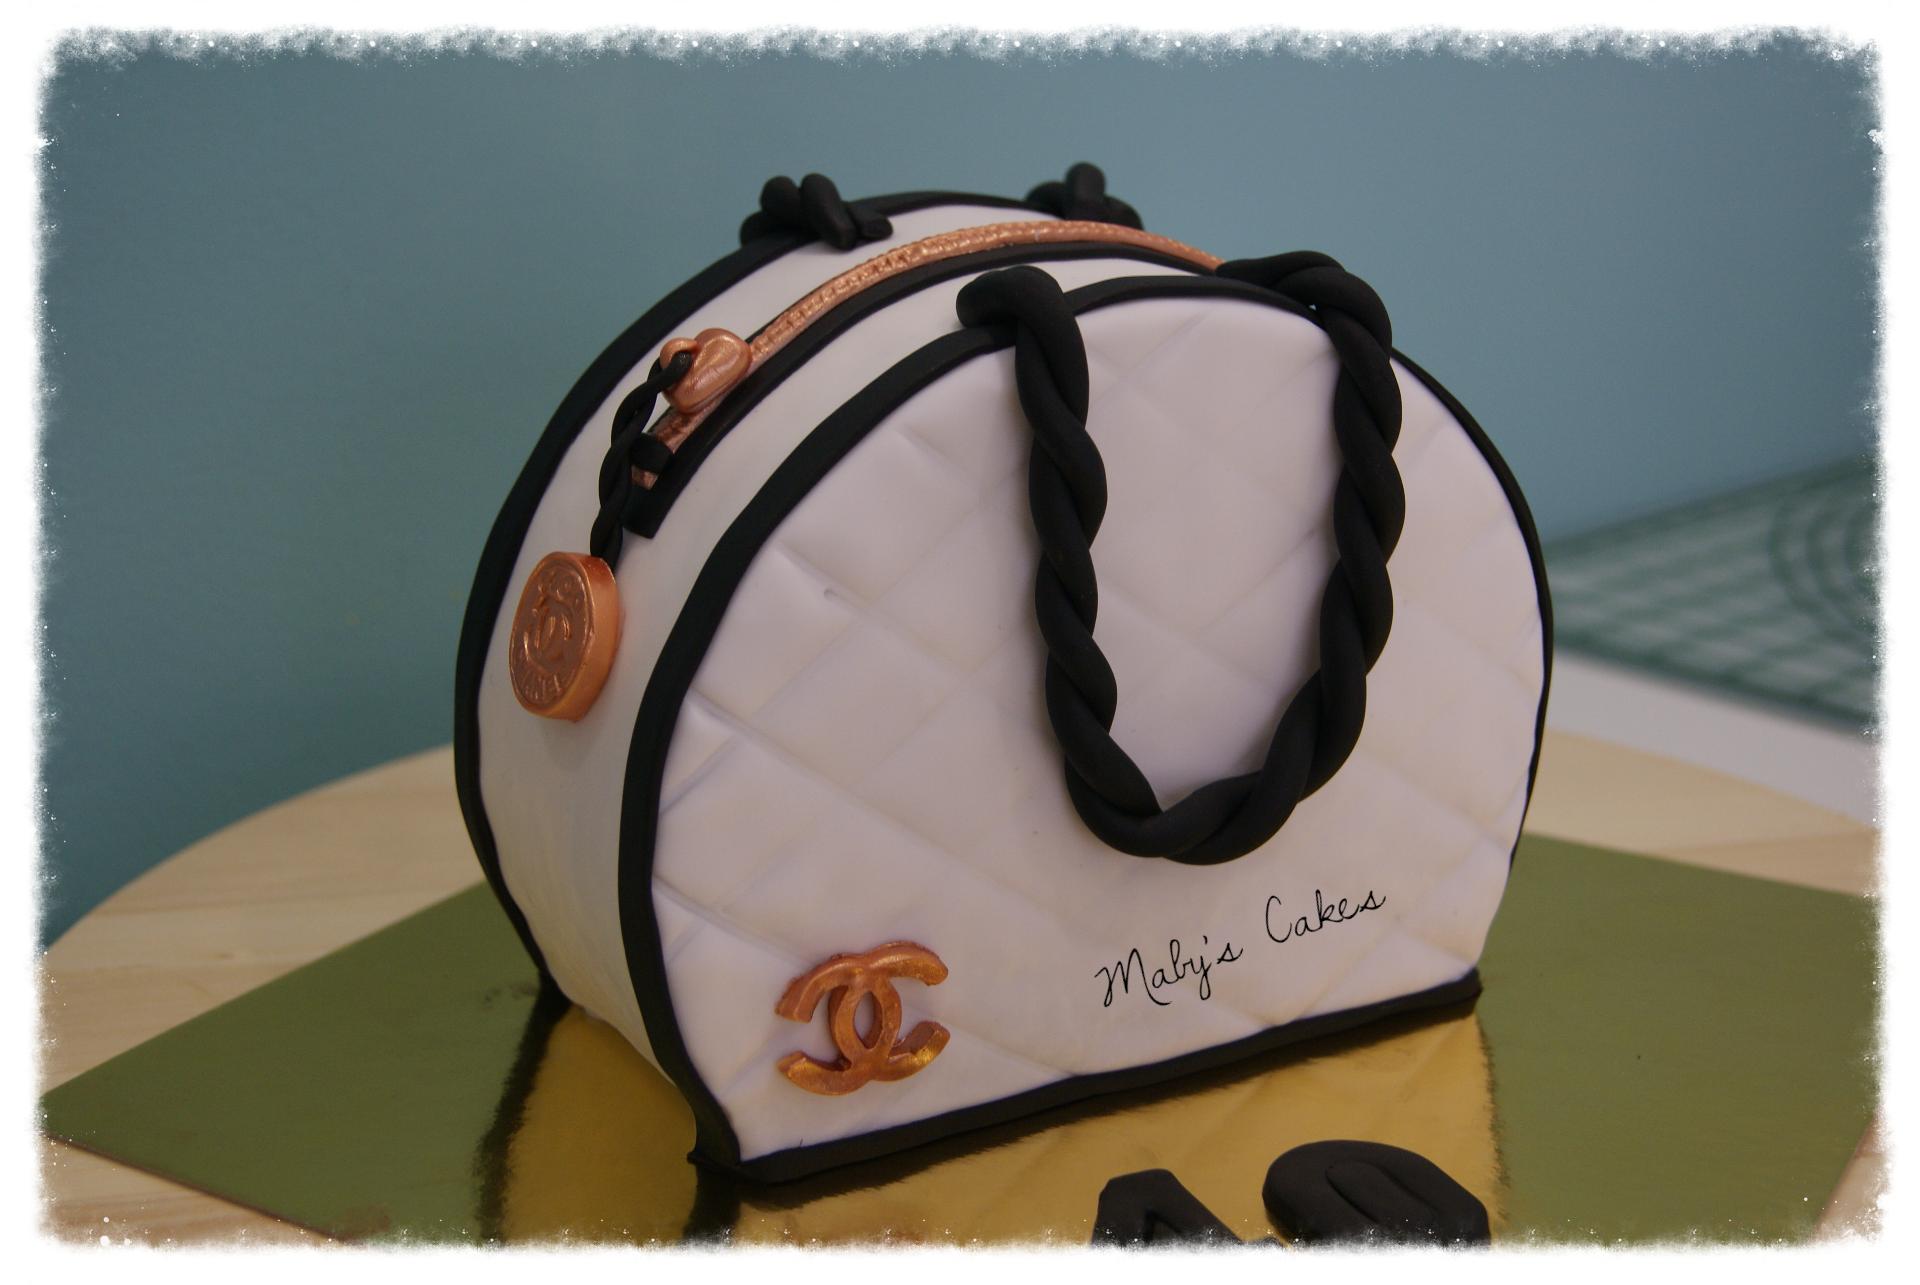 Mabyscakes.com Bolso channel tartas fondant Sabadell pastel personalizado terrassa (7)_edited